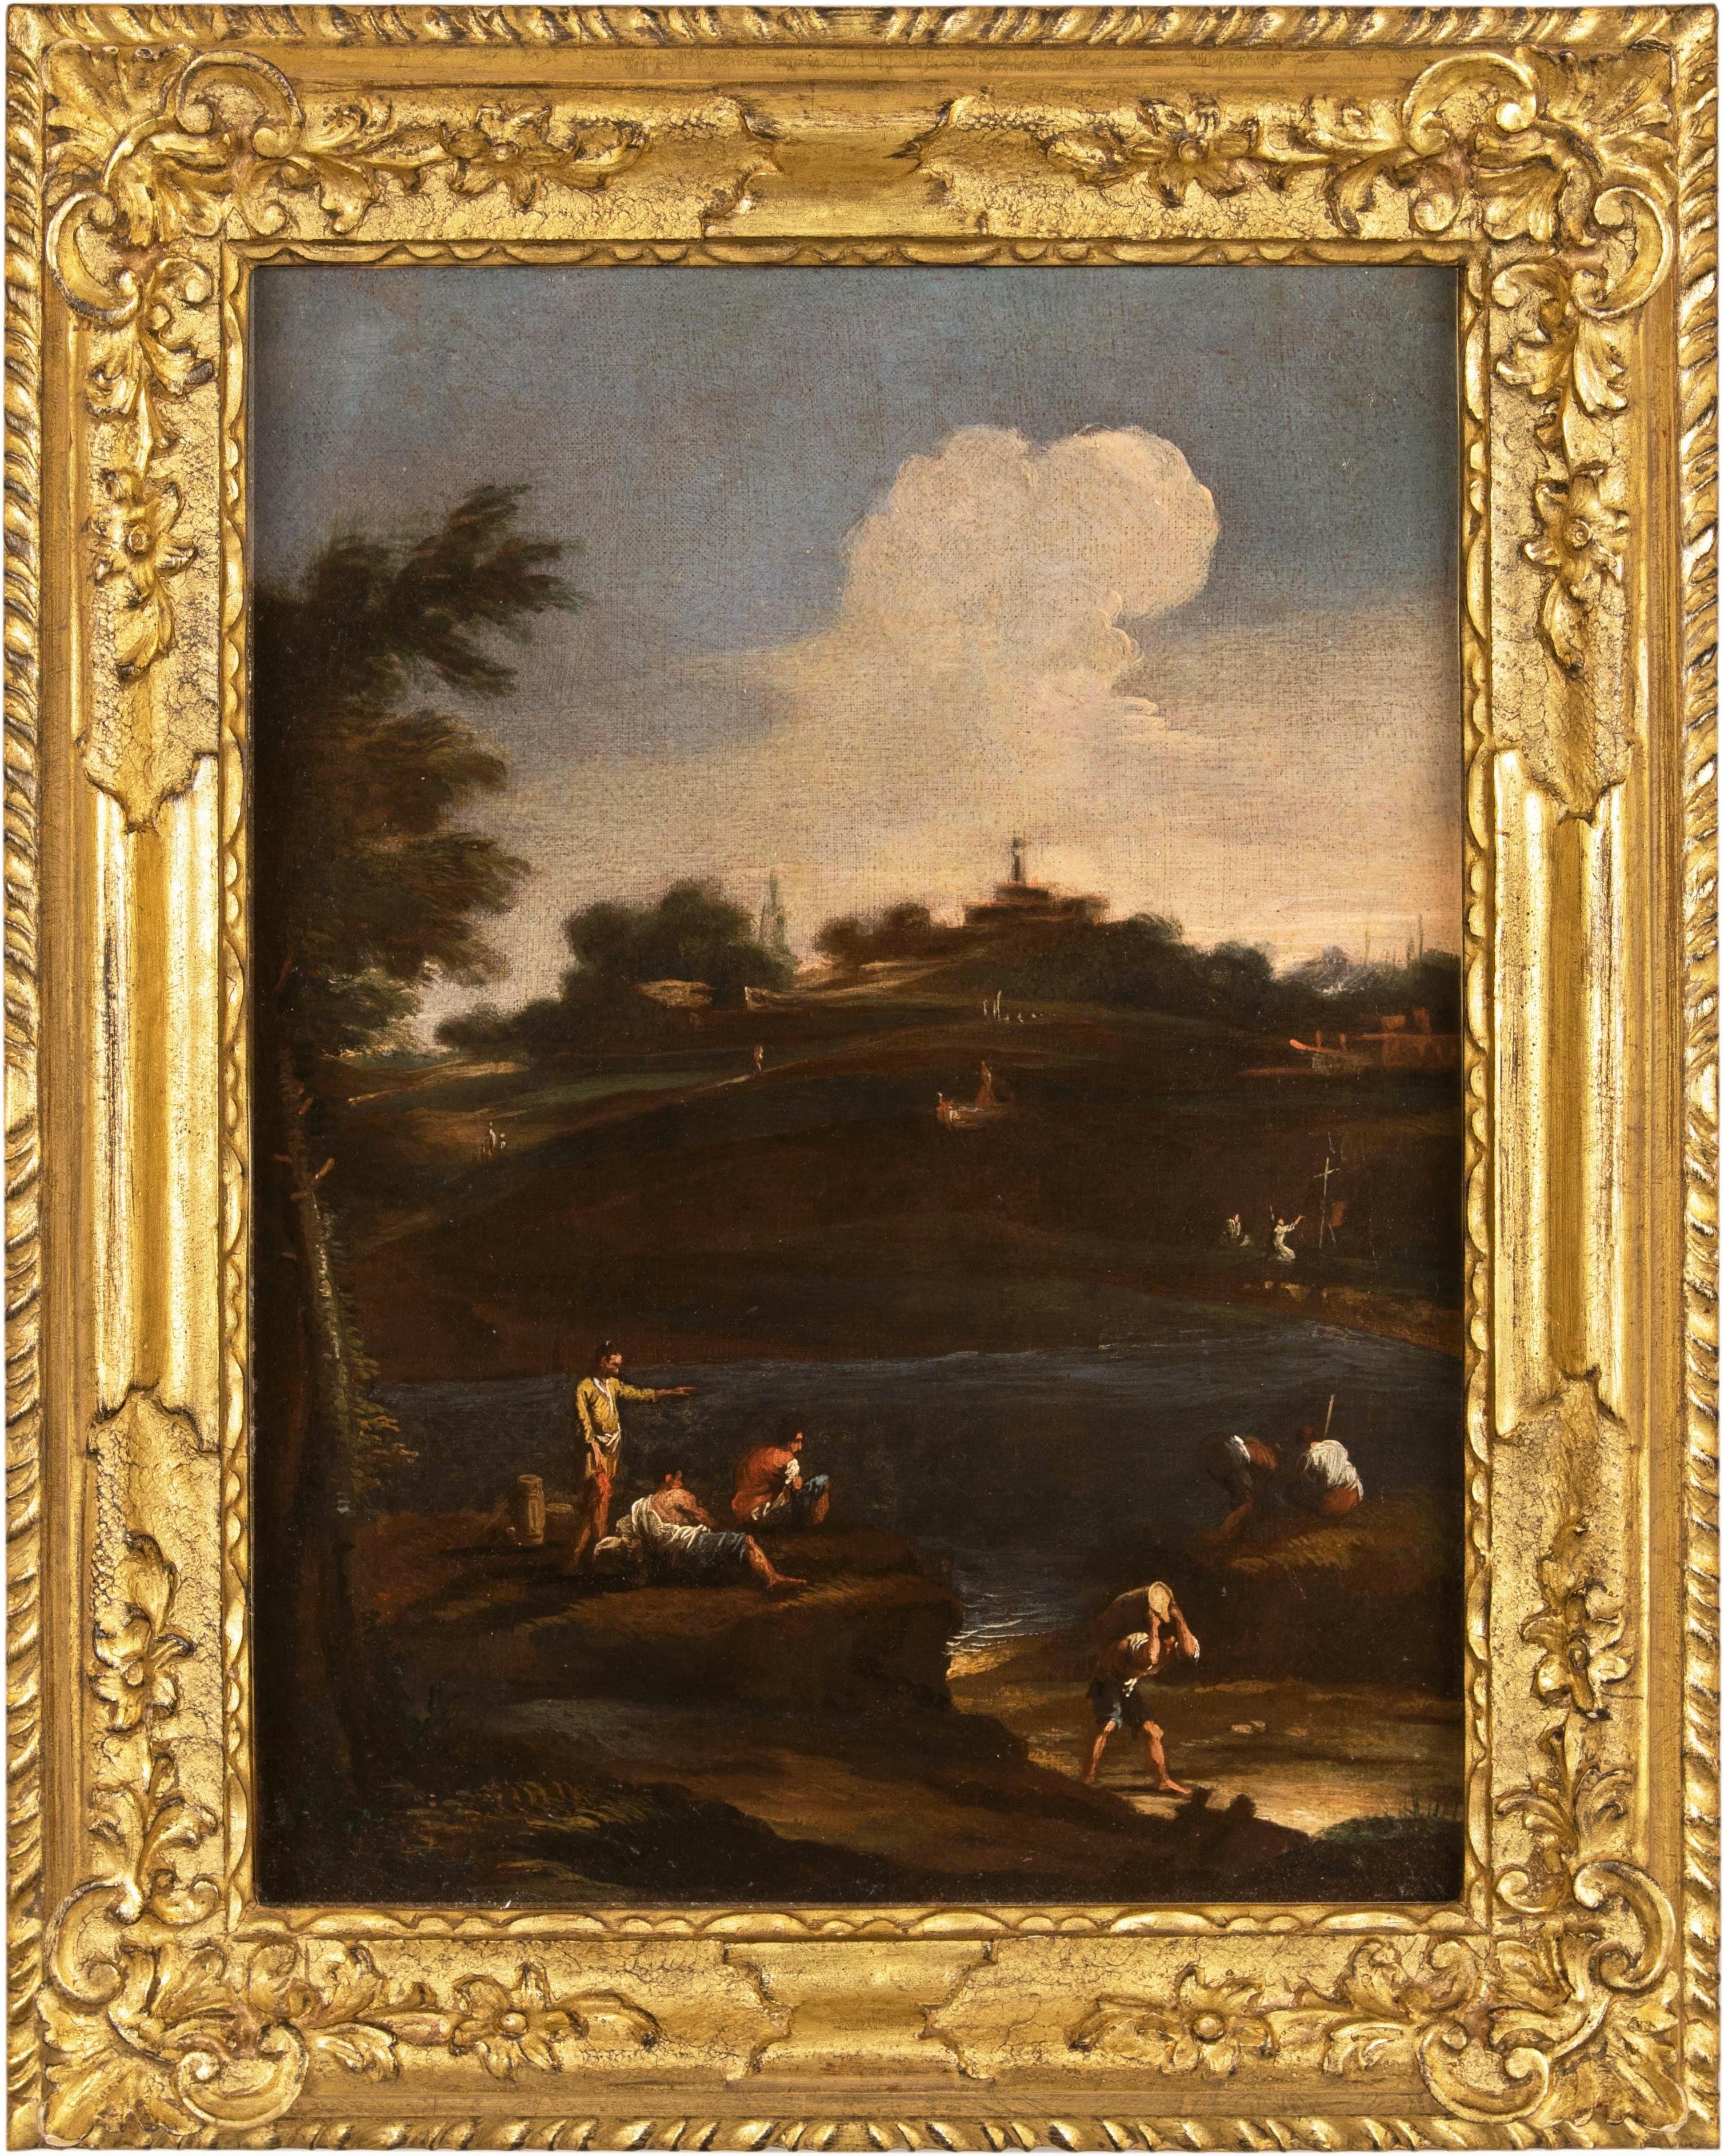 18th century Venetian figure painting - Landscape - Oil on canvas venice Italy